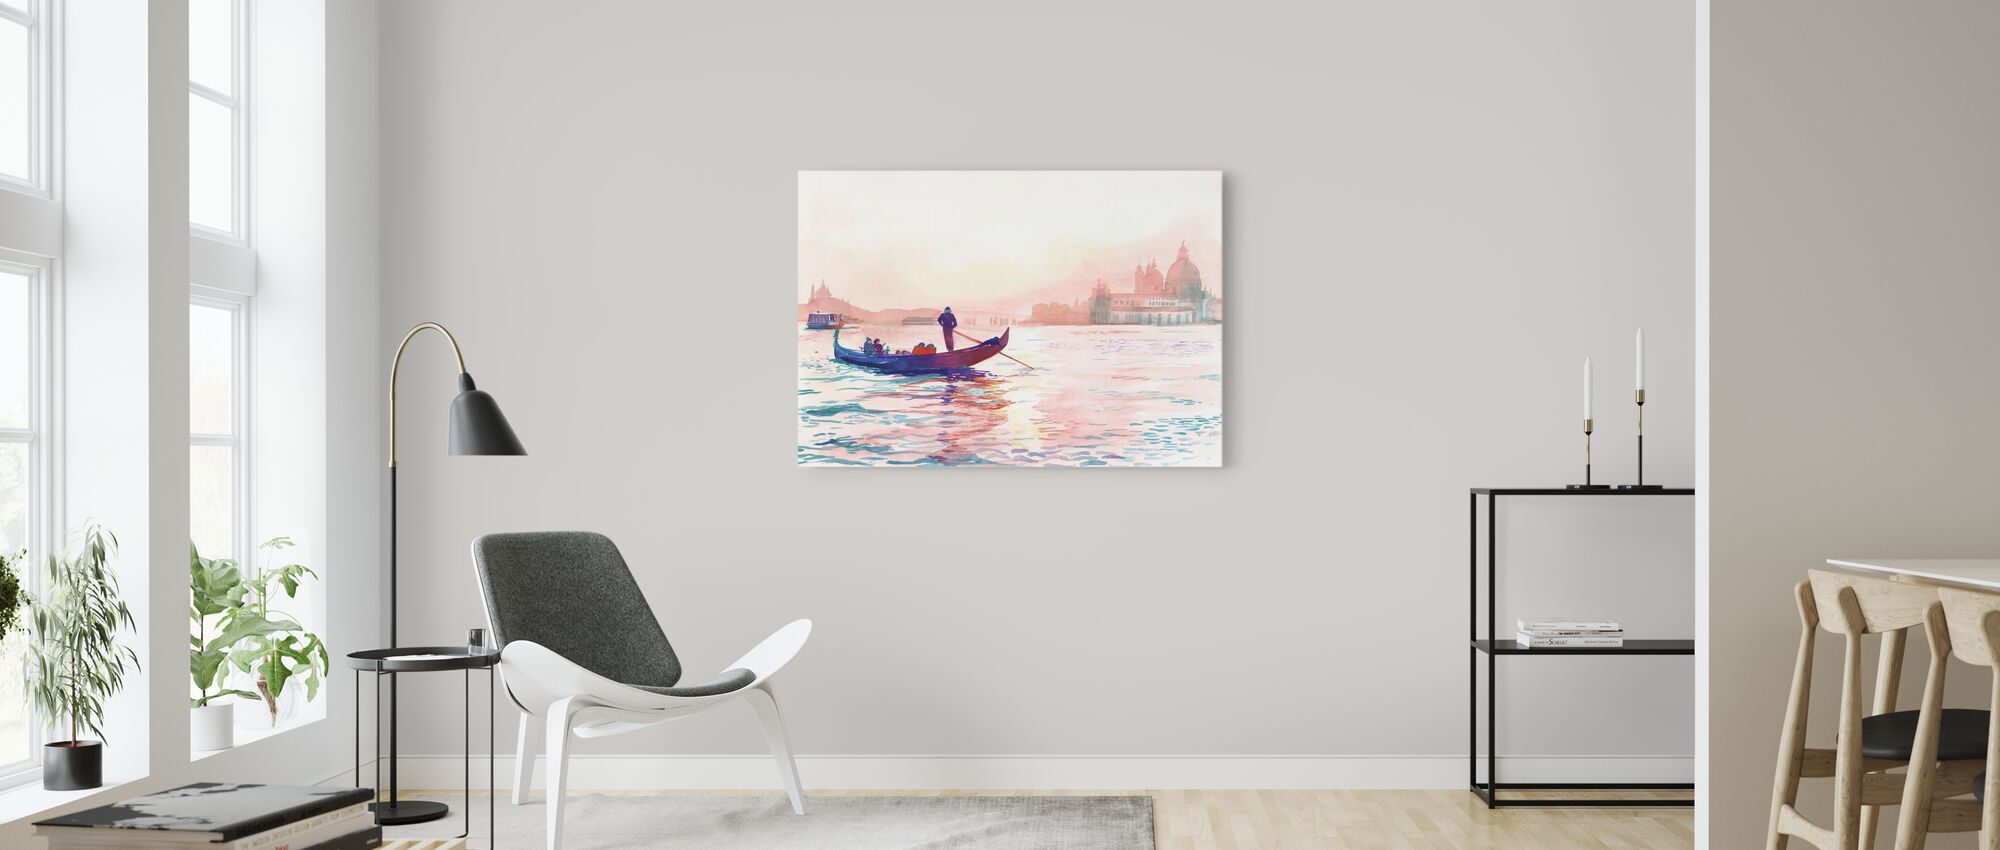 The Grand Hotel Venice - Canvas print - Living Room